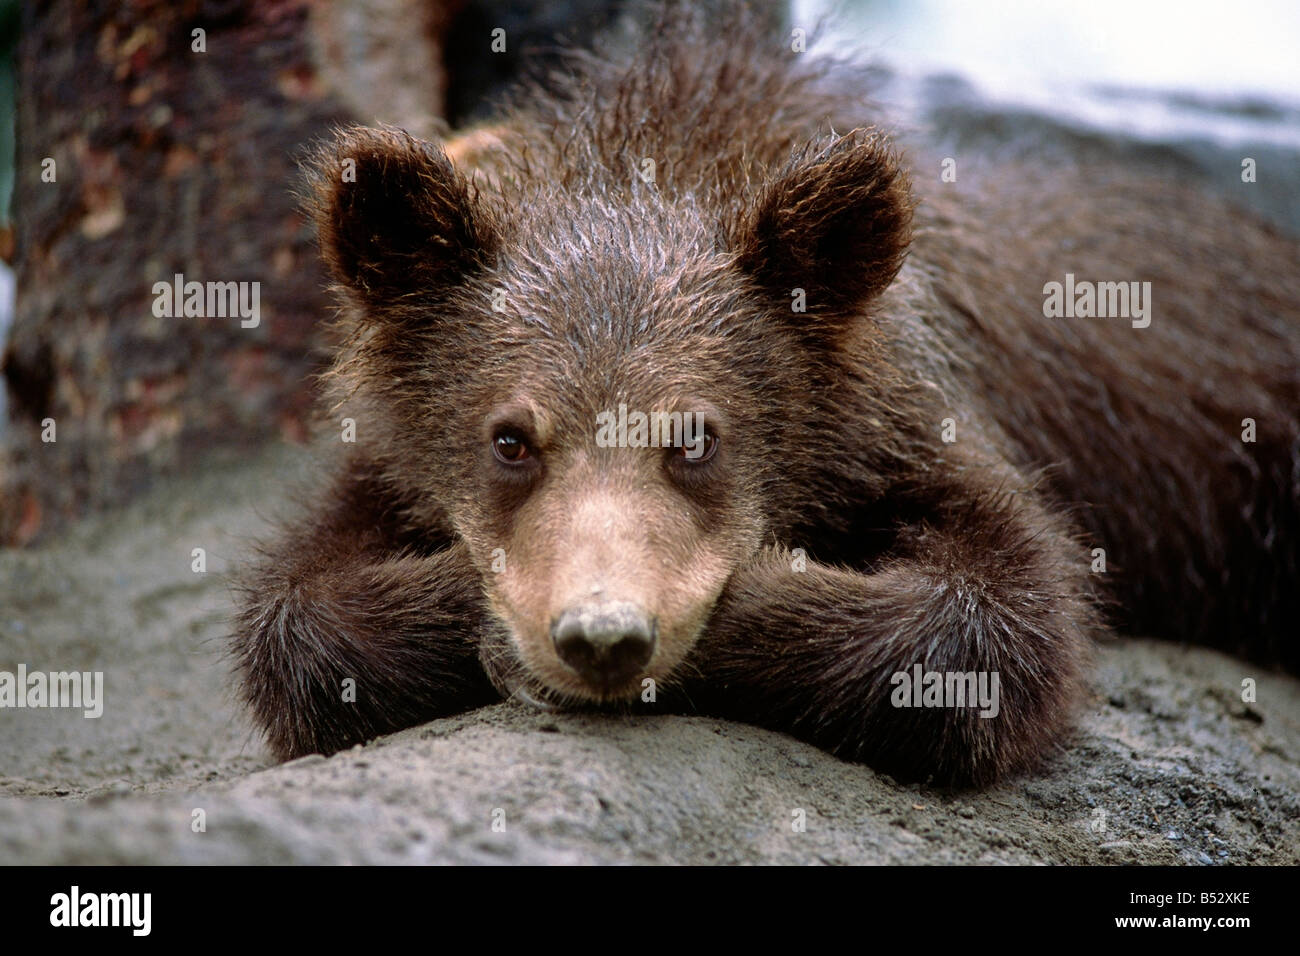 Grizzly bear cub laying on ground Alaska Wildlife Conservation Center SC Alaska Summer Captive - Stock Image